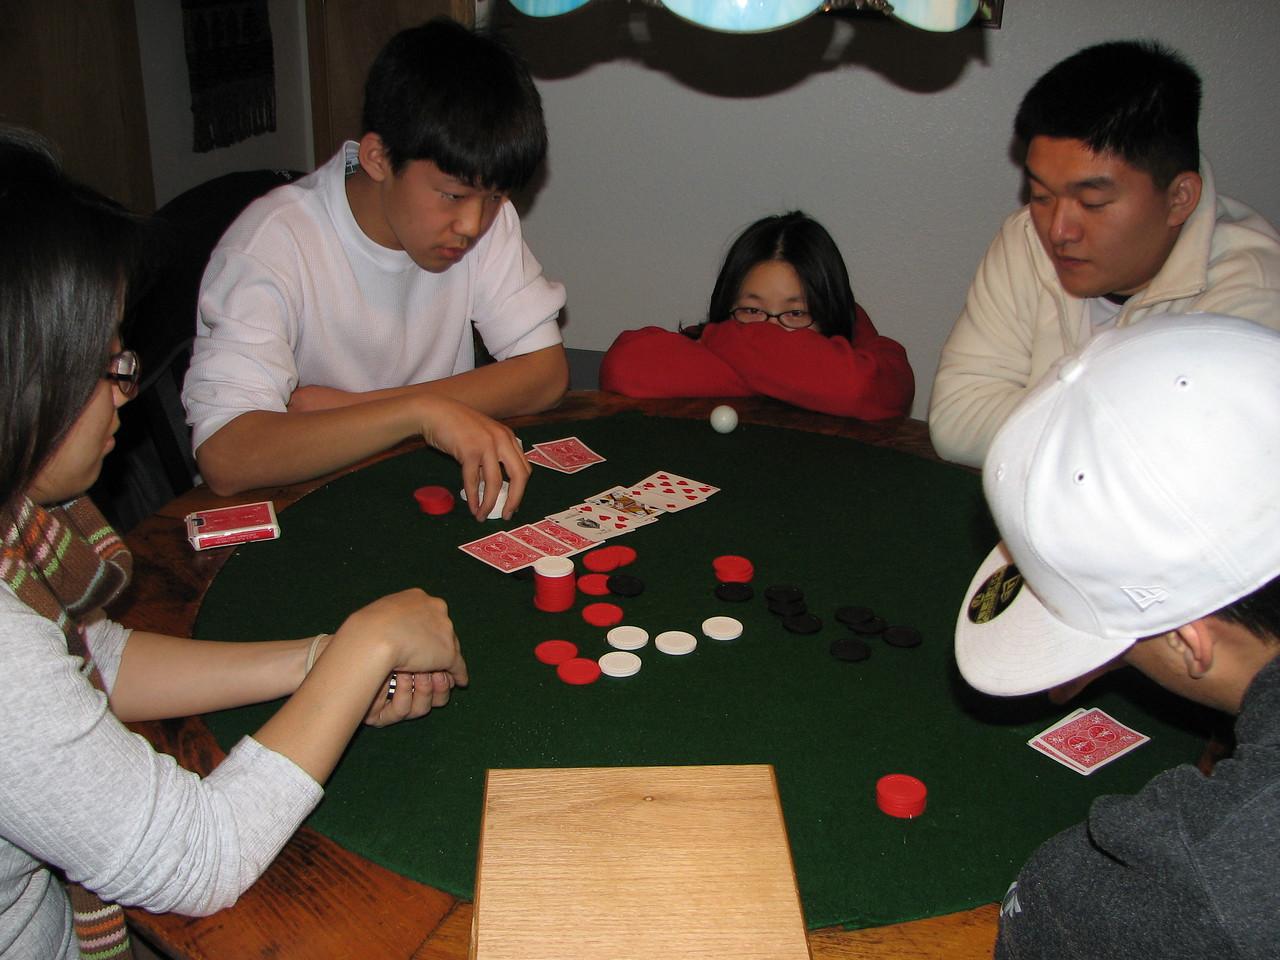 2006 12 20 Wed - Shinae Kim, Jay Lee, Angela Hsu, Dan Tung, & Ted Hong hold 'em Texas 1